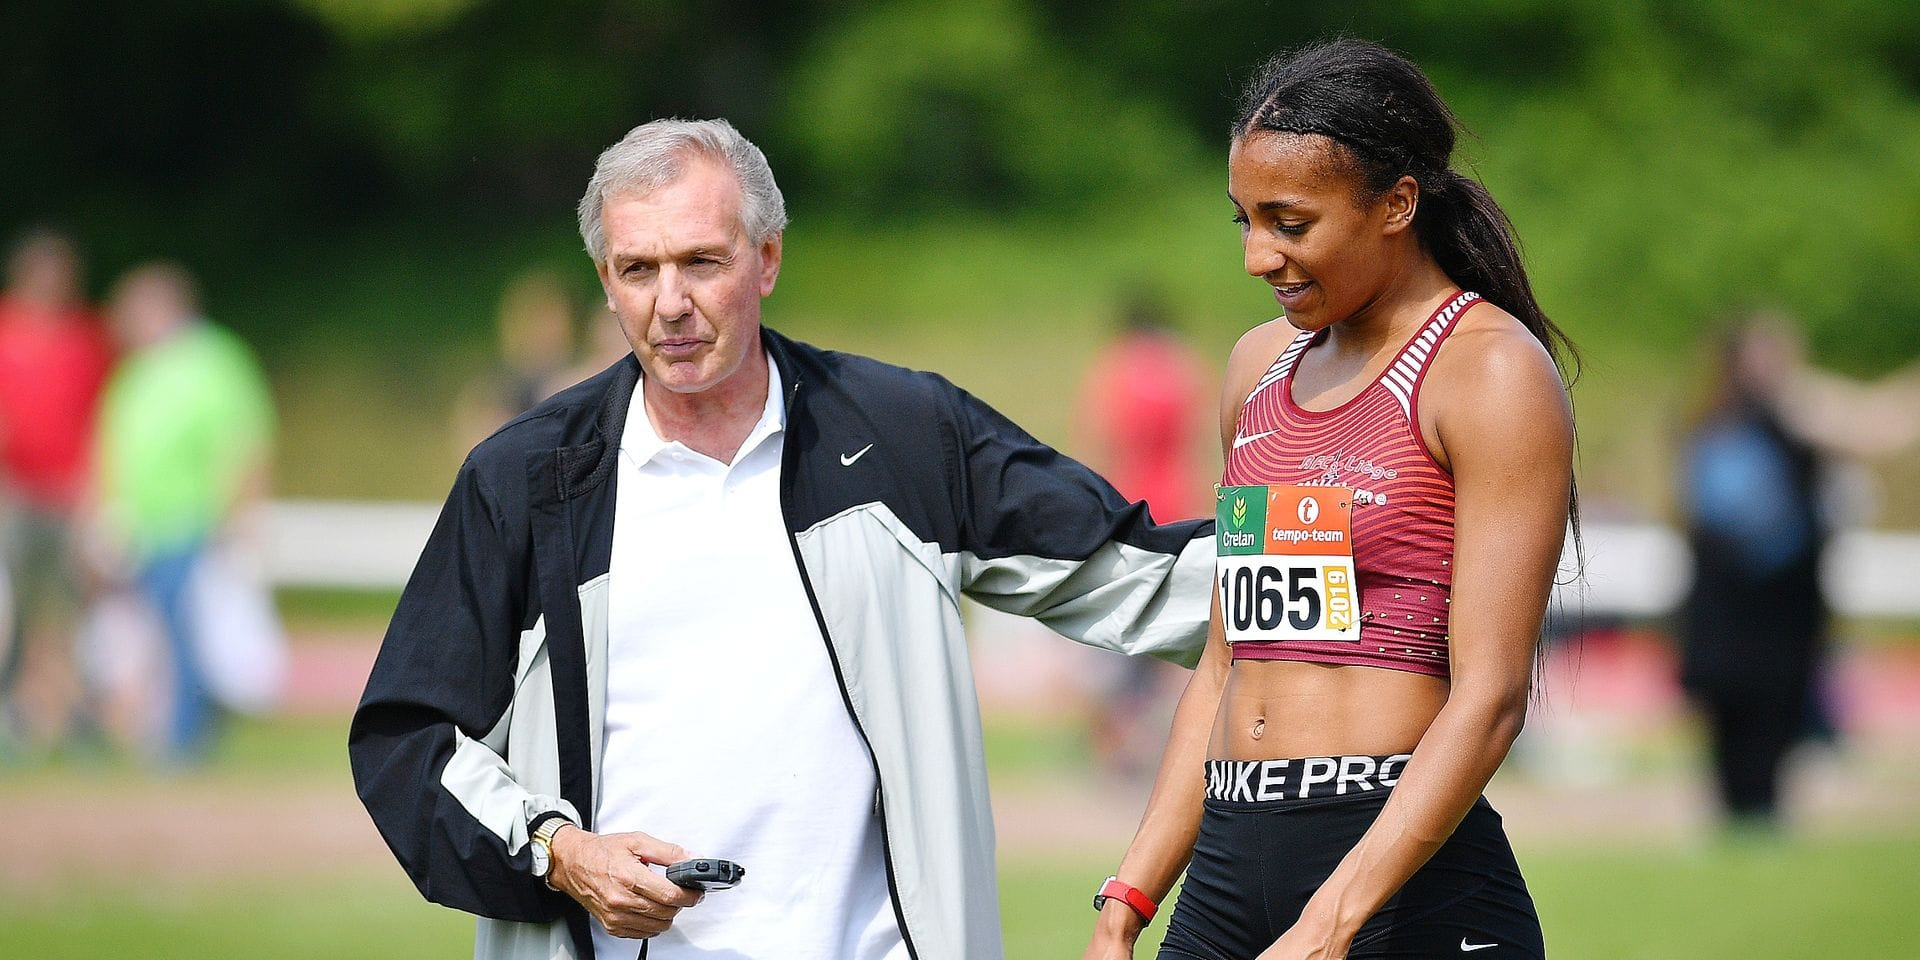 Belgian athlete Nafissatou 'Nafi' Thiam and her coach Roger Lespagnard pictured after the 200m race at the RUSTA Intercercles women's athletics meeting, Saturday 18 May 2019 in Gaurain-Ramecroix, Tournai. BELGA PHOTO DAVID STOCKMAN